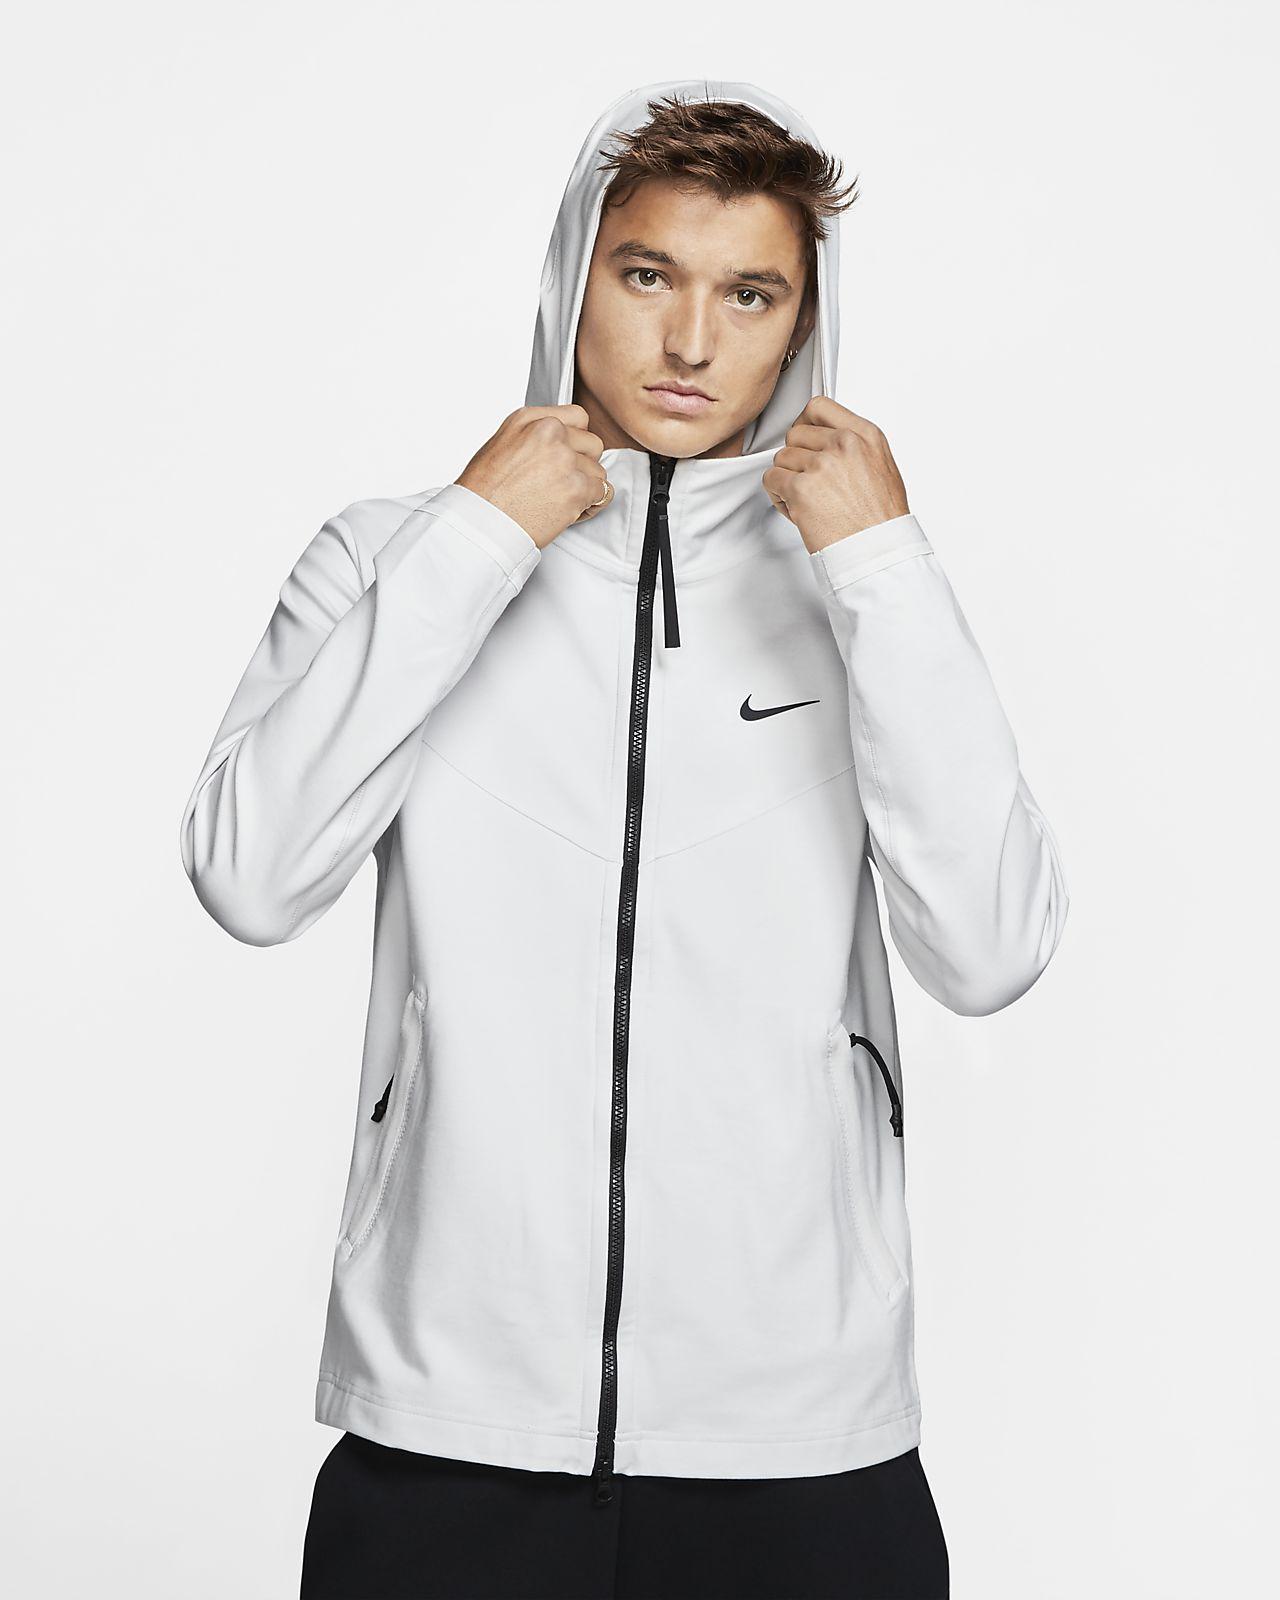 herrenjacke nike sportswear